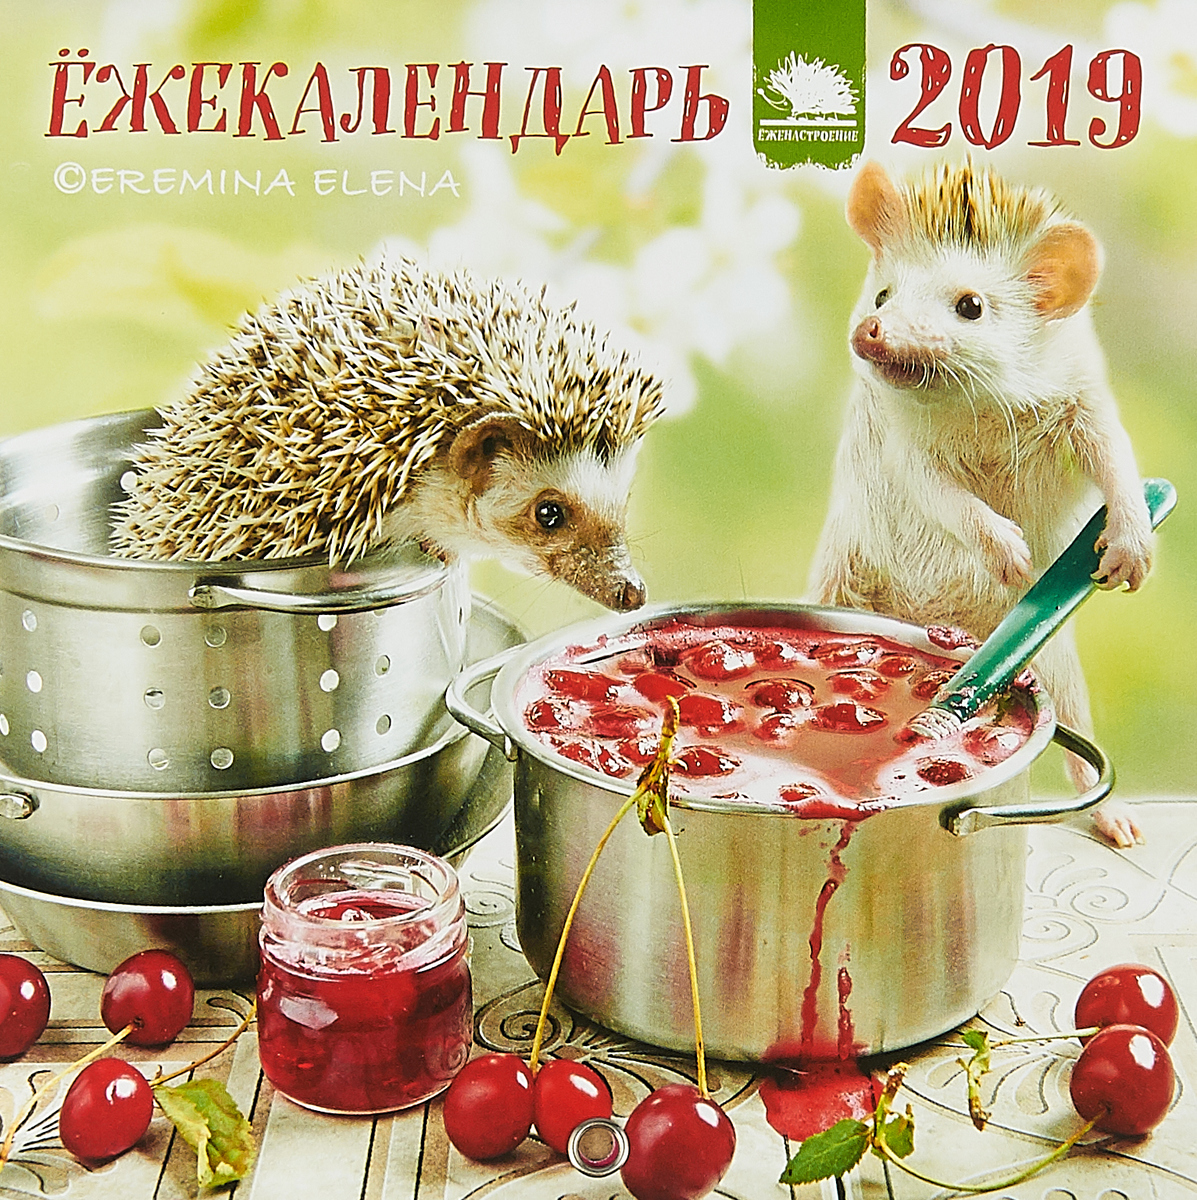 Ёжекалендарь 2019. Календарь настенный с ежиками календарь считать дни онлайн